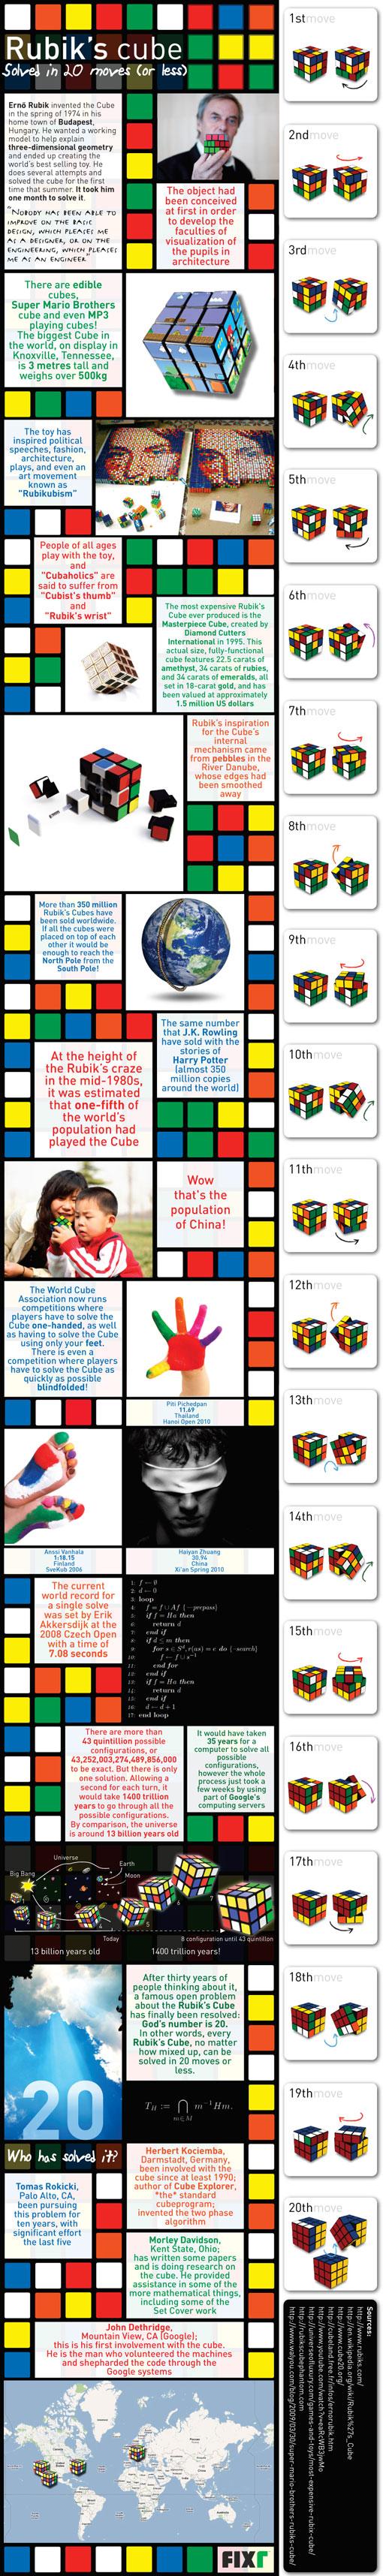 Rubik's Cube Facts